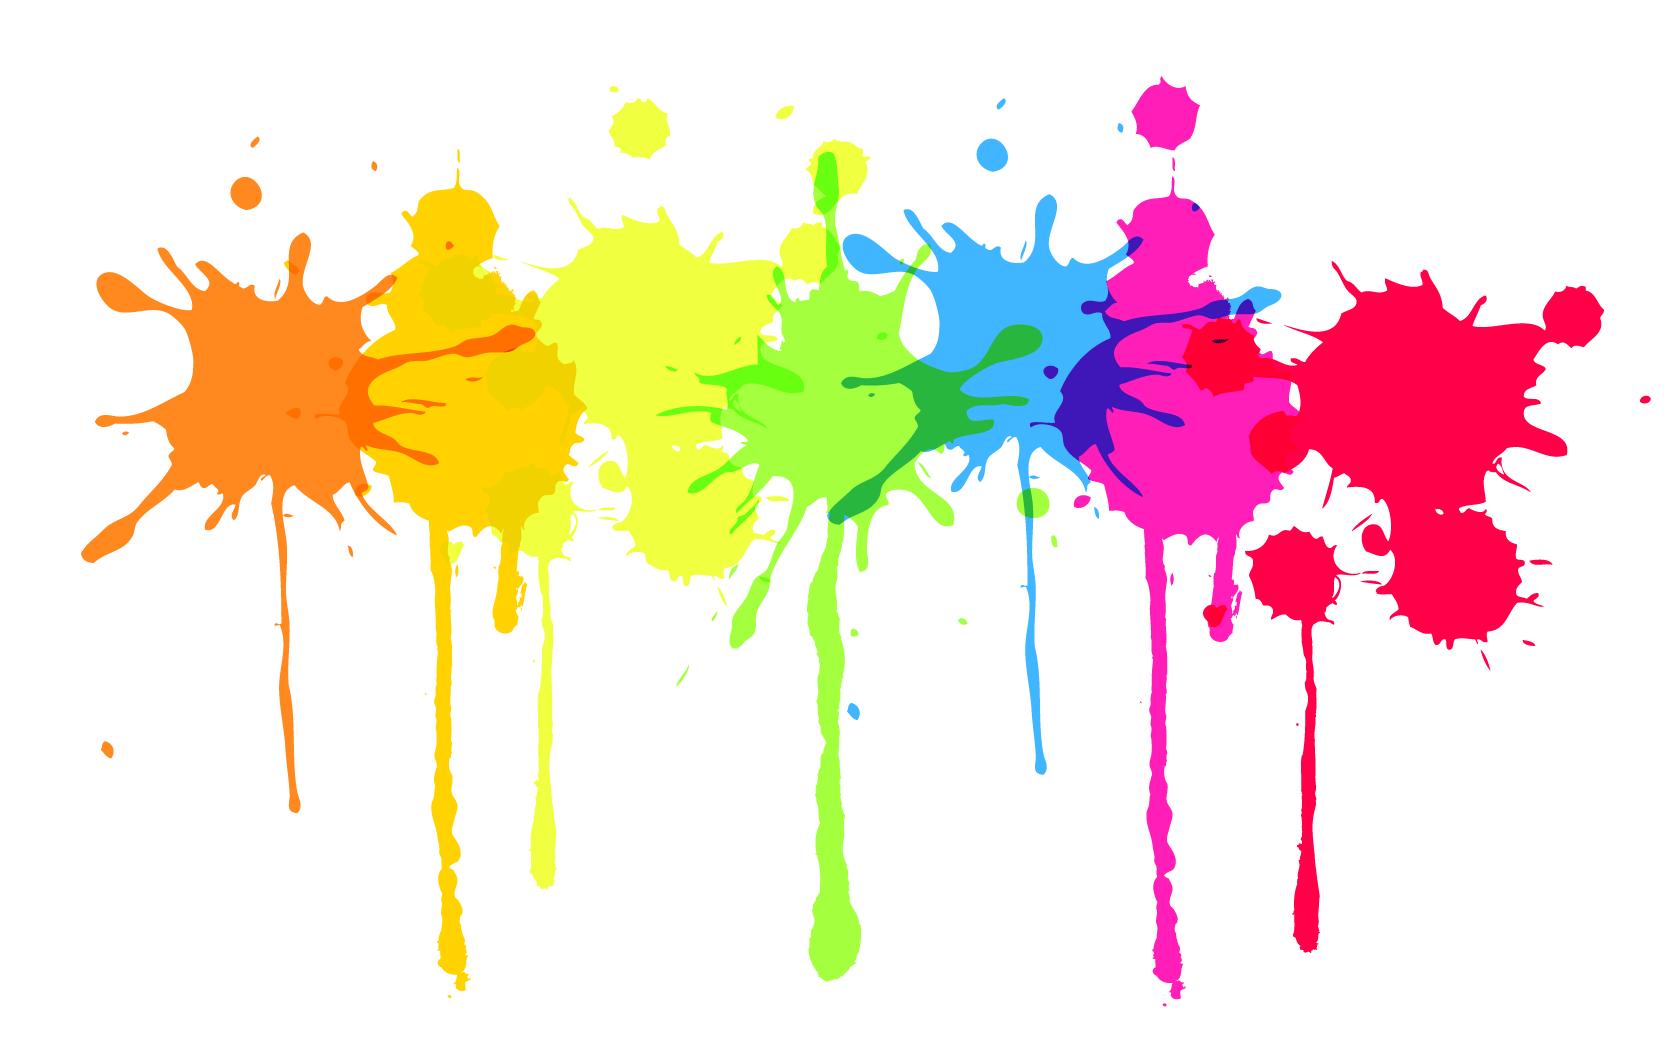 ... Paint Splatter Png ...